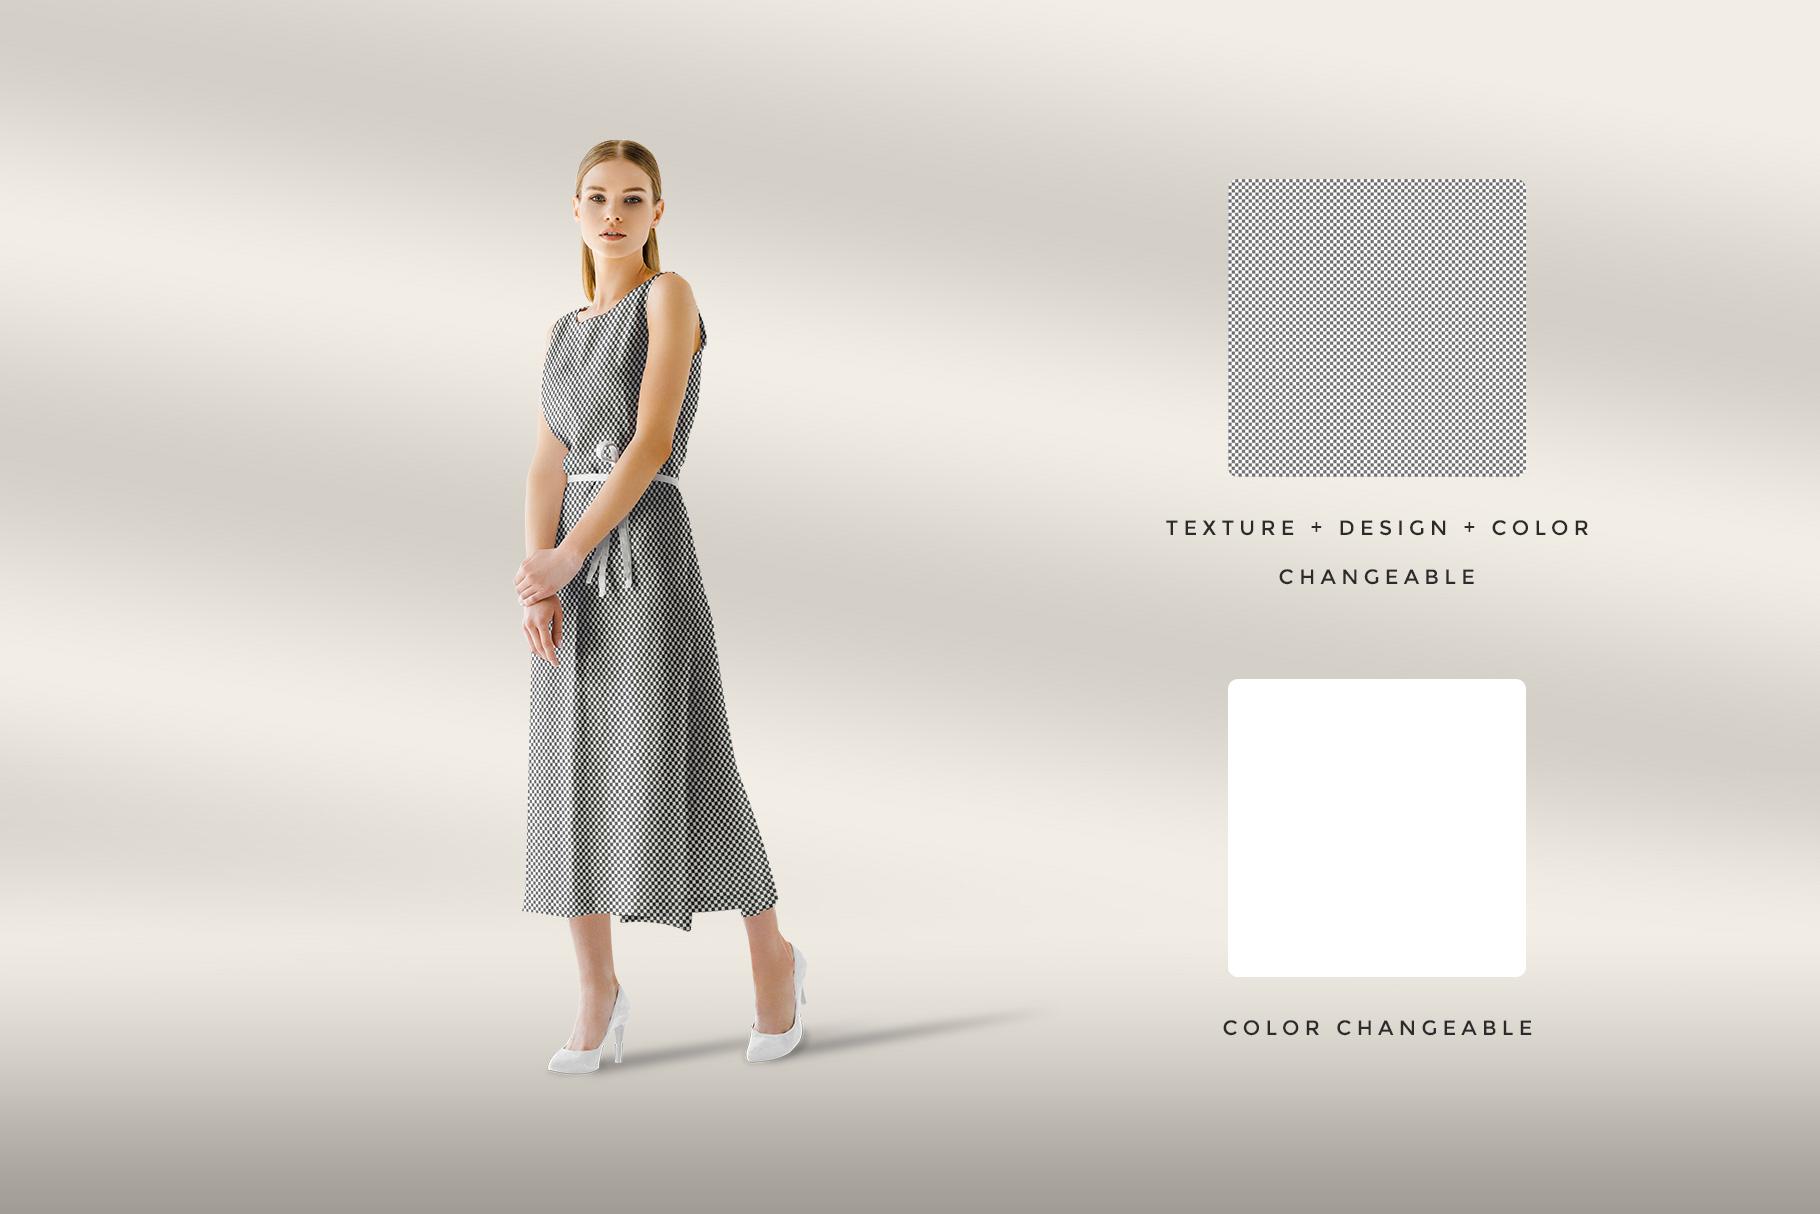 editability of the women's sleeveless summer dress mockup vol.2